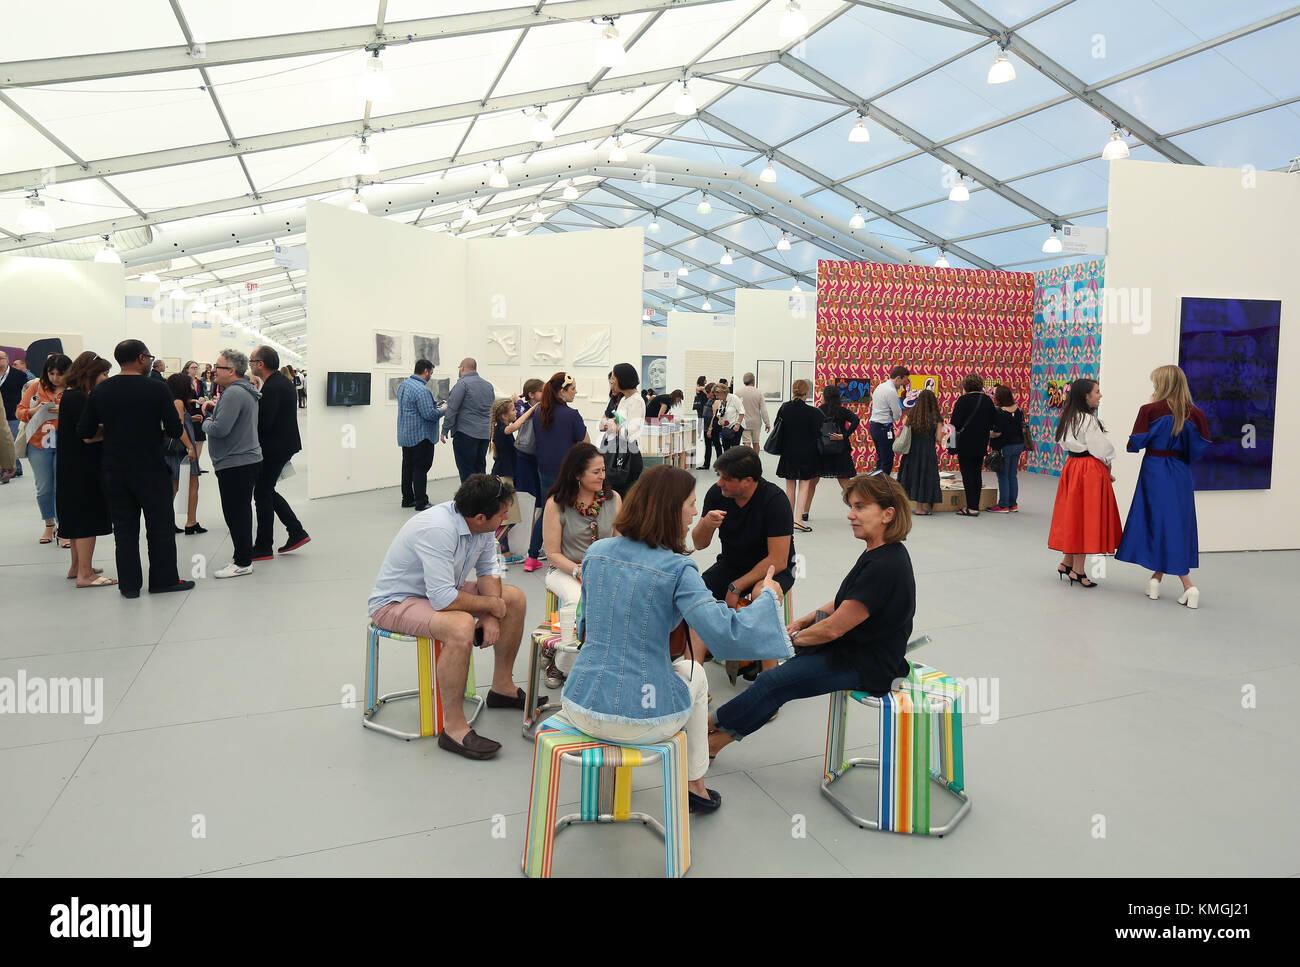 Art Basel Public Stockfotos & Art Basel Public Bilder - Alamy